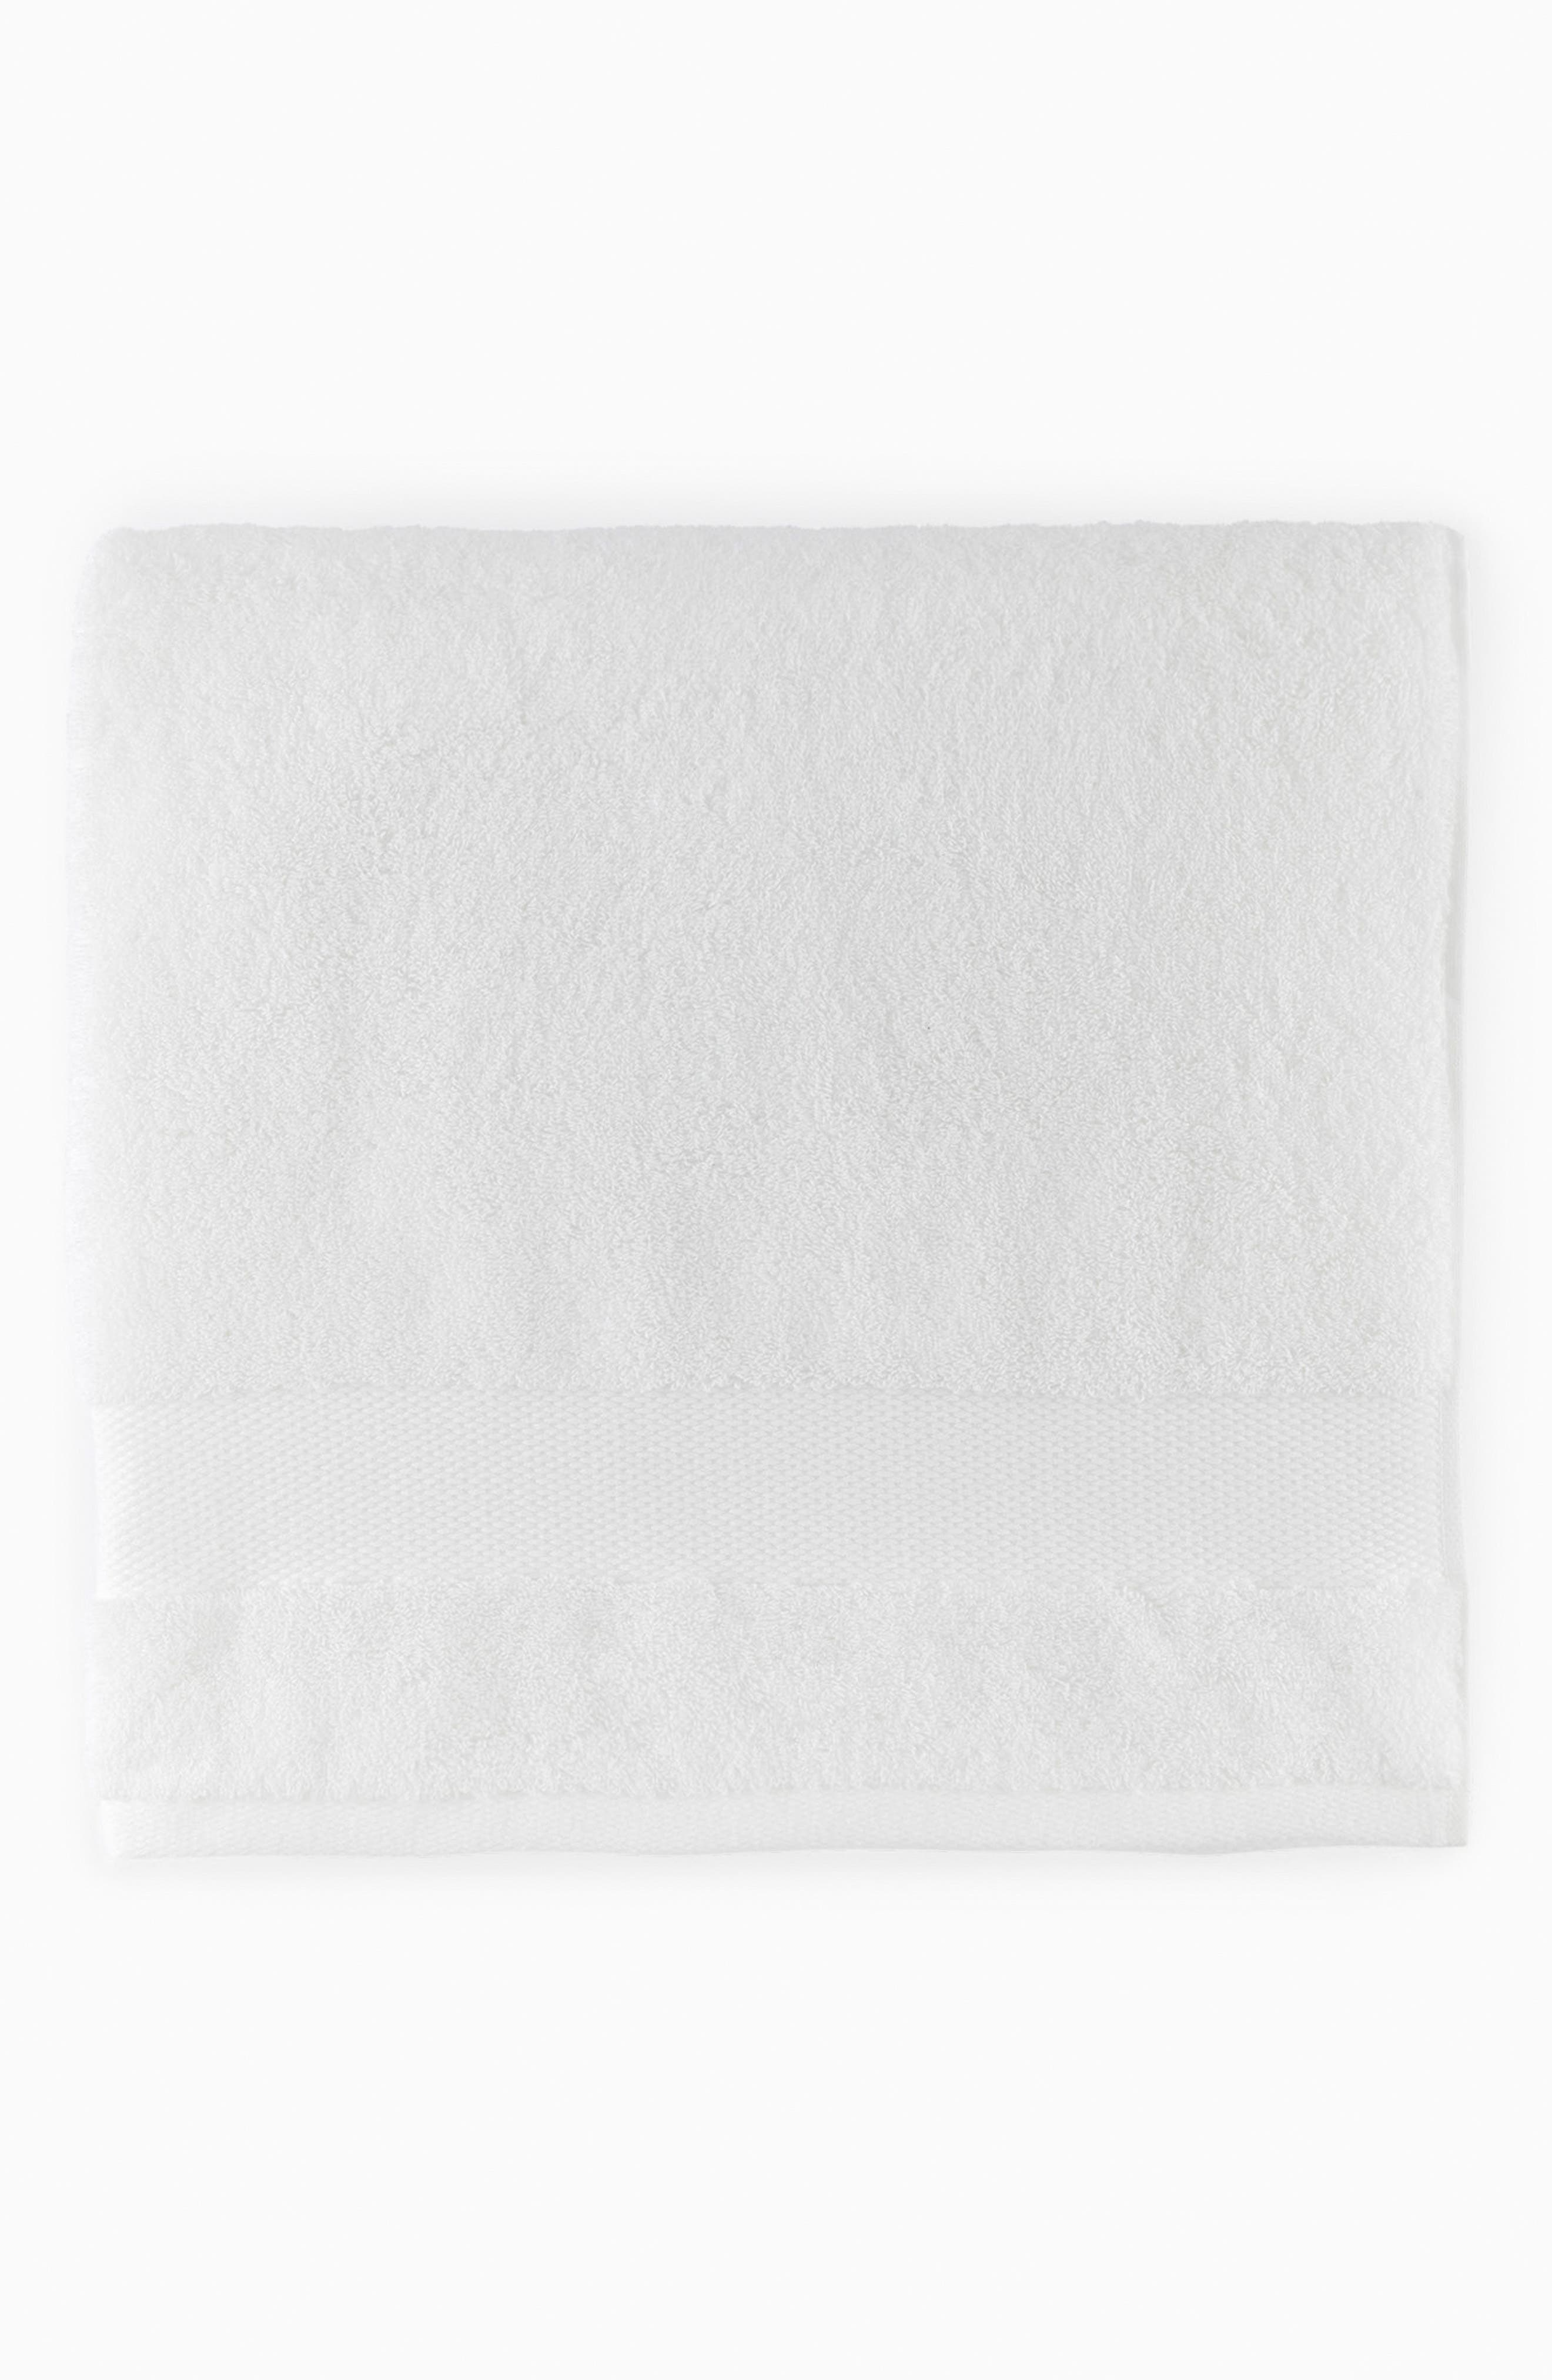 Bello Tip Towel,                             Main thumbnail 1, color,                             100